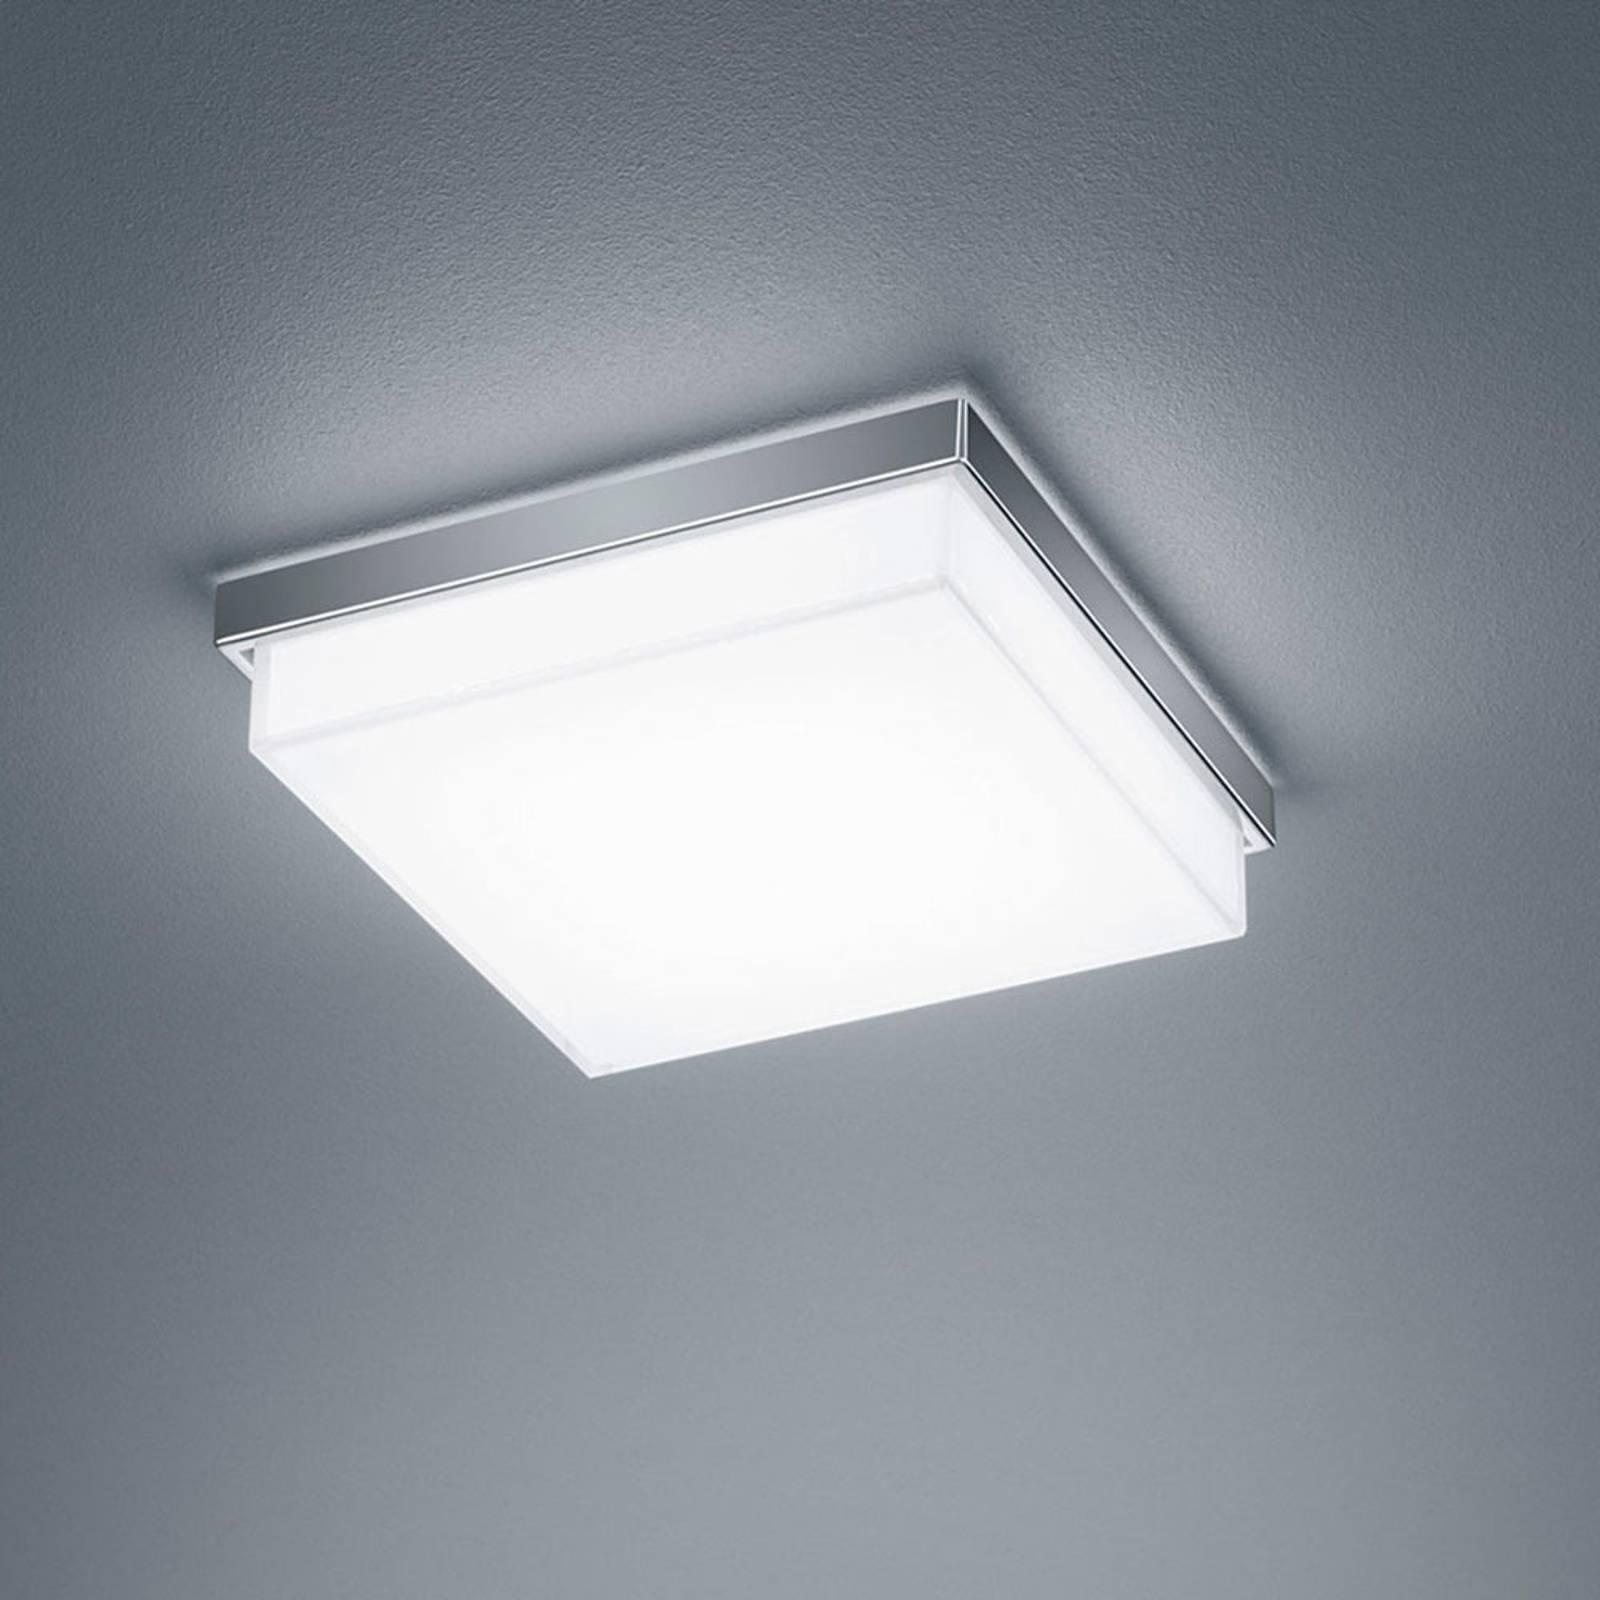 Helestra Cosi LED plafondlamp chroom 21x21 cm